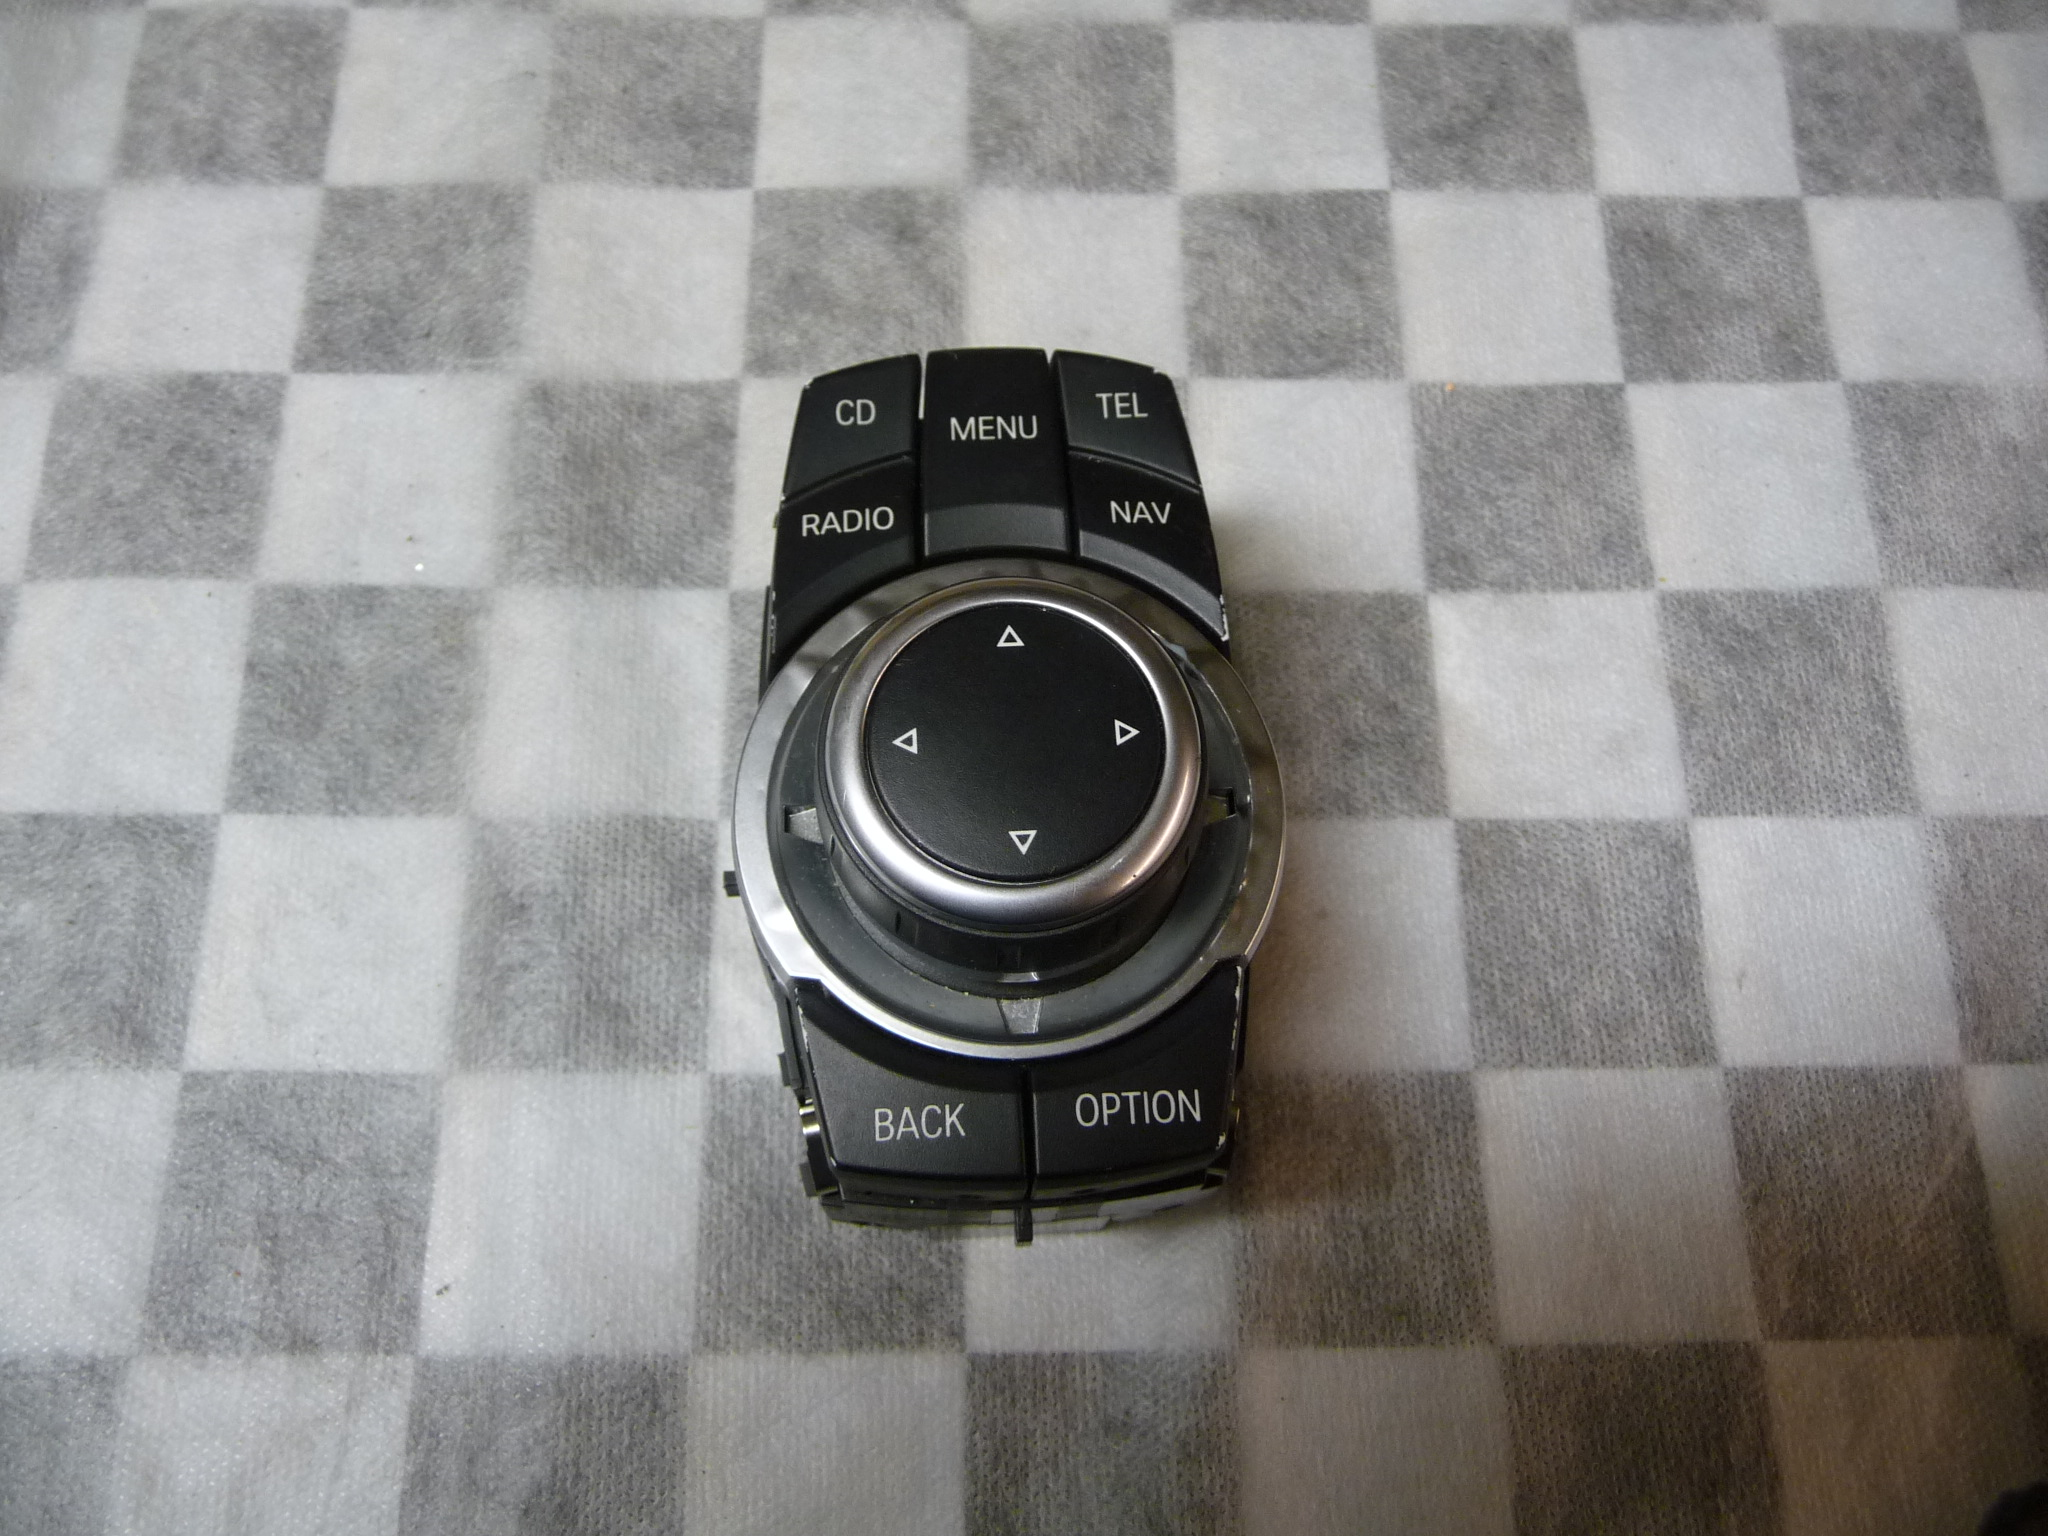 BMW 1 3 5 6 X1 X5 X6 iDrive Central Console Controller Joystick 65829231116 OEM